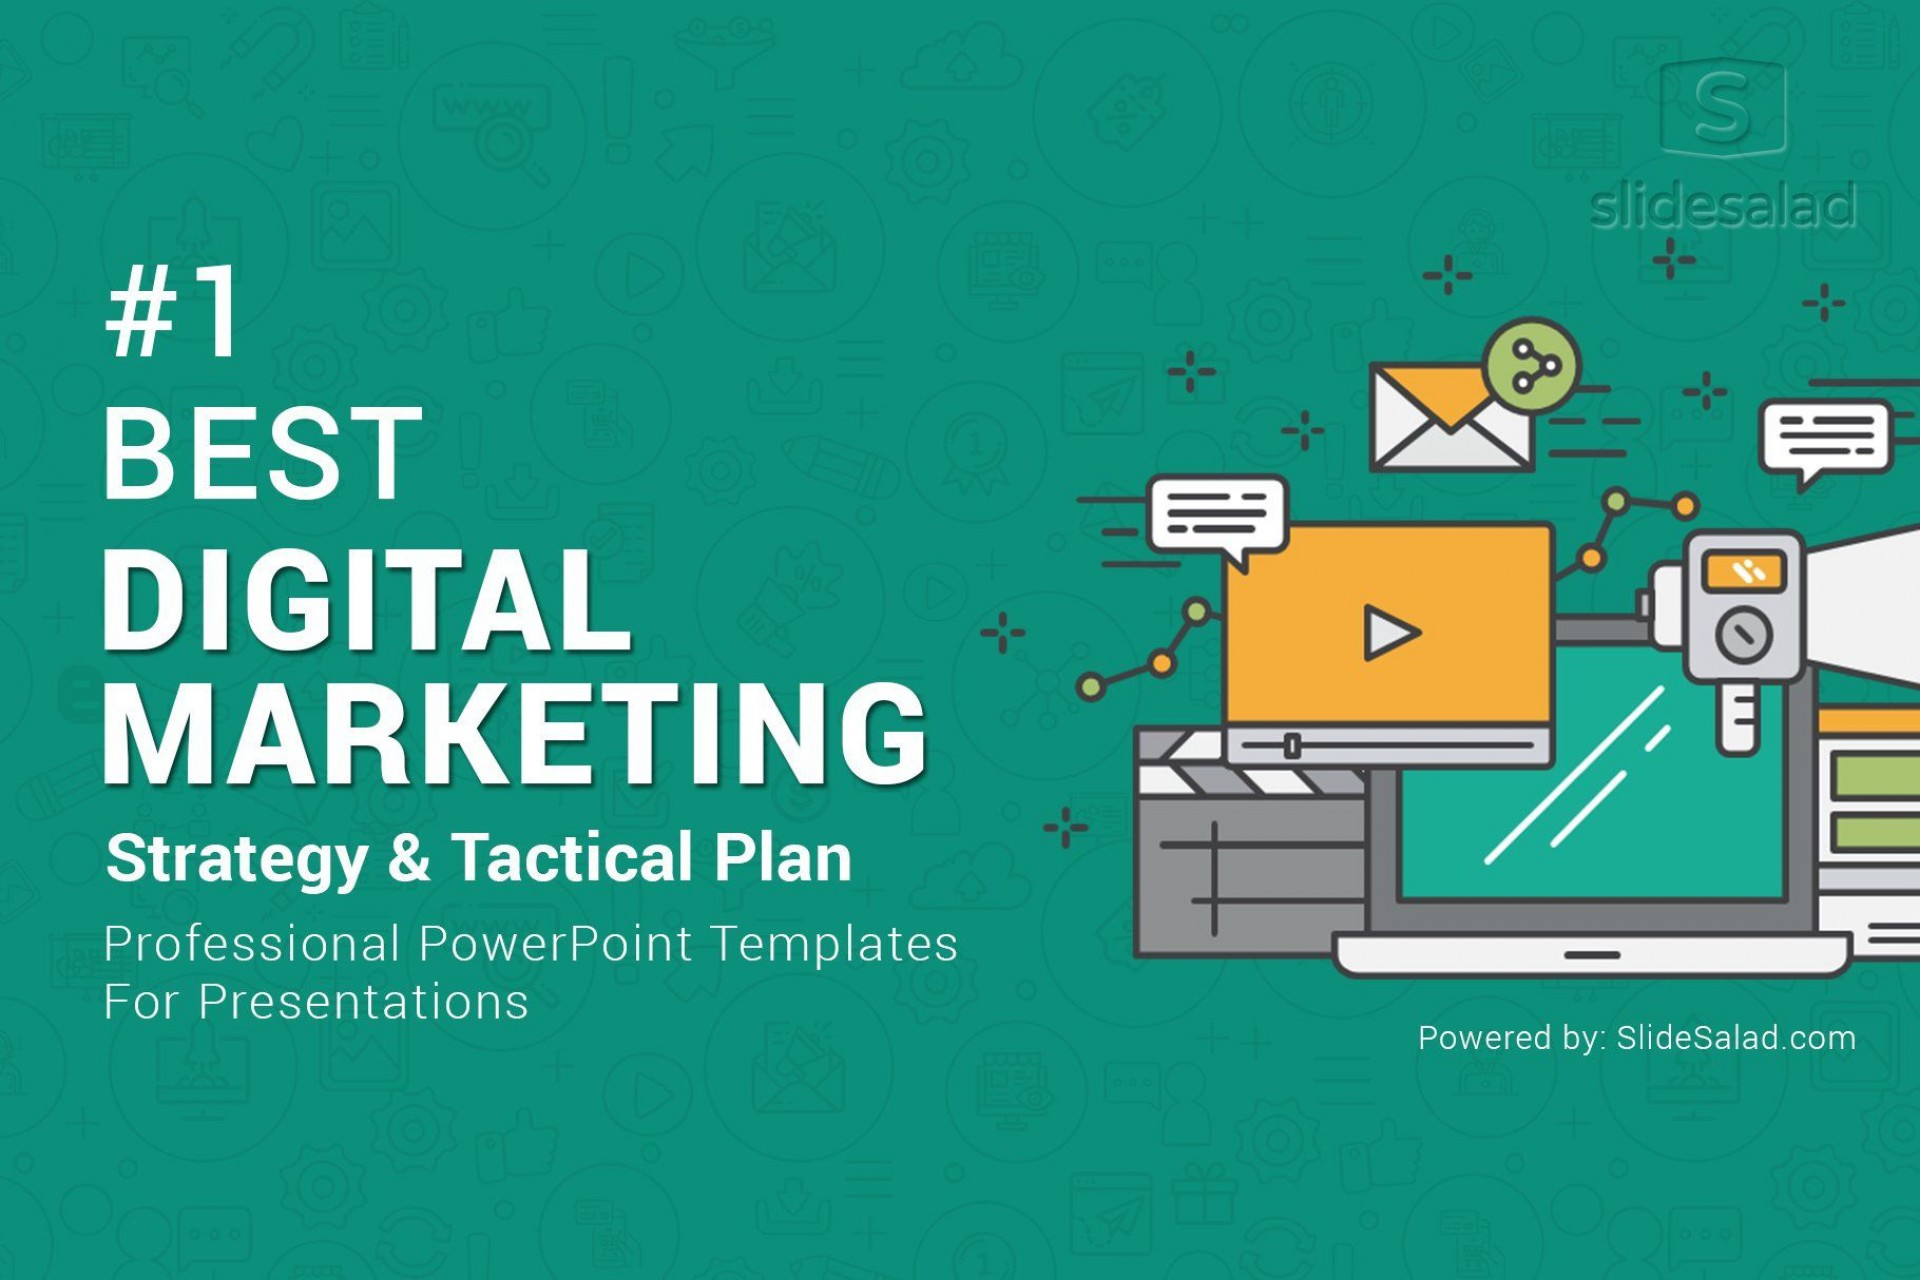 009 Magnificent Digital Marketing Plan Template Ppt Example  Presentation Free Slideshare1920